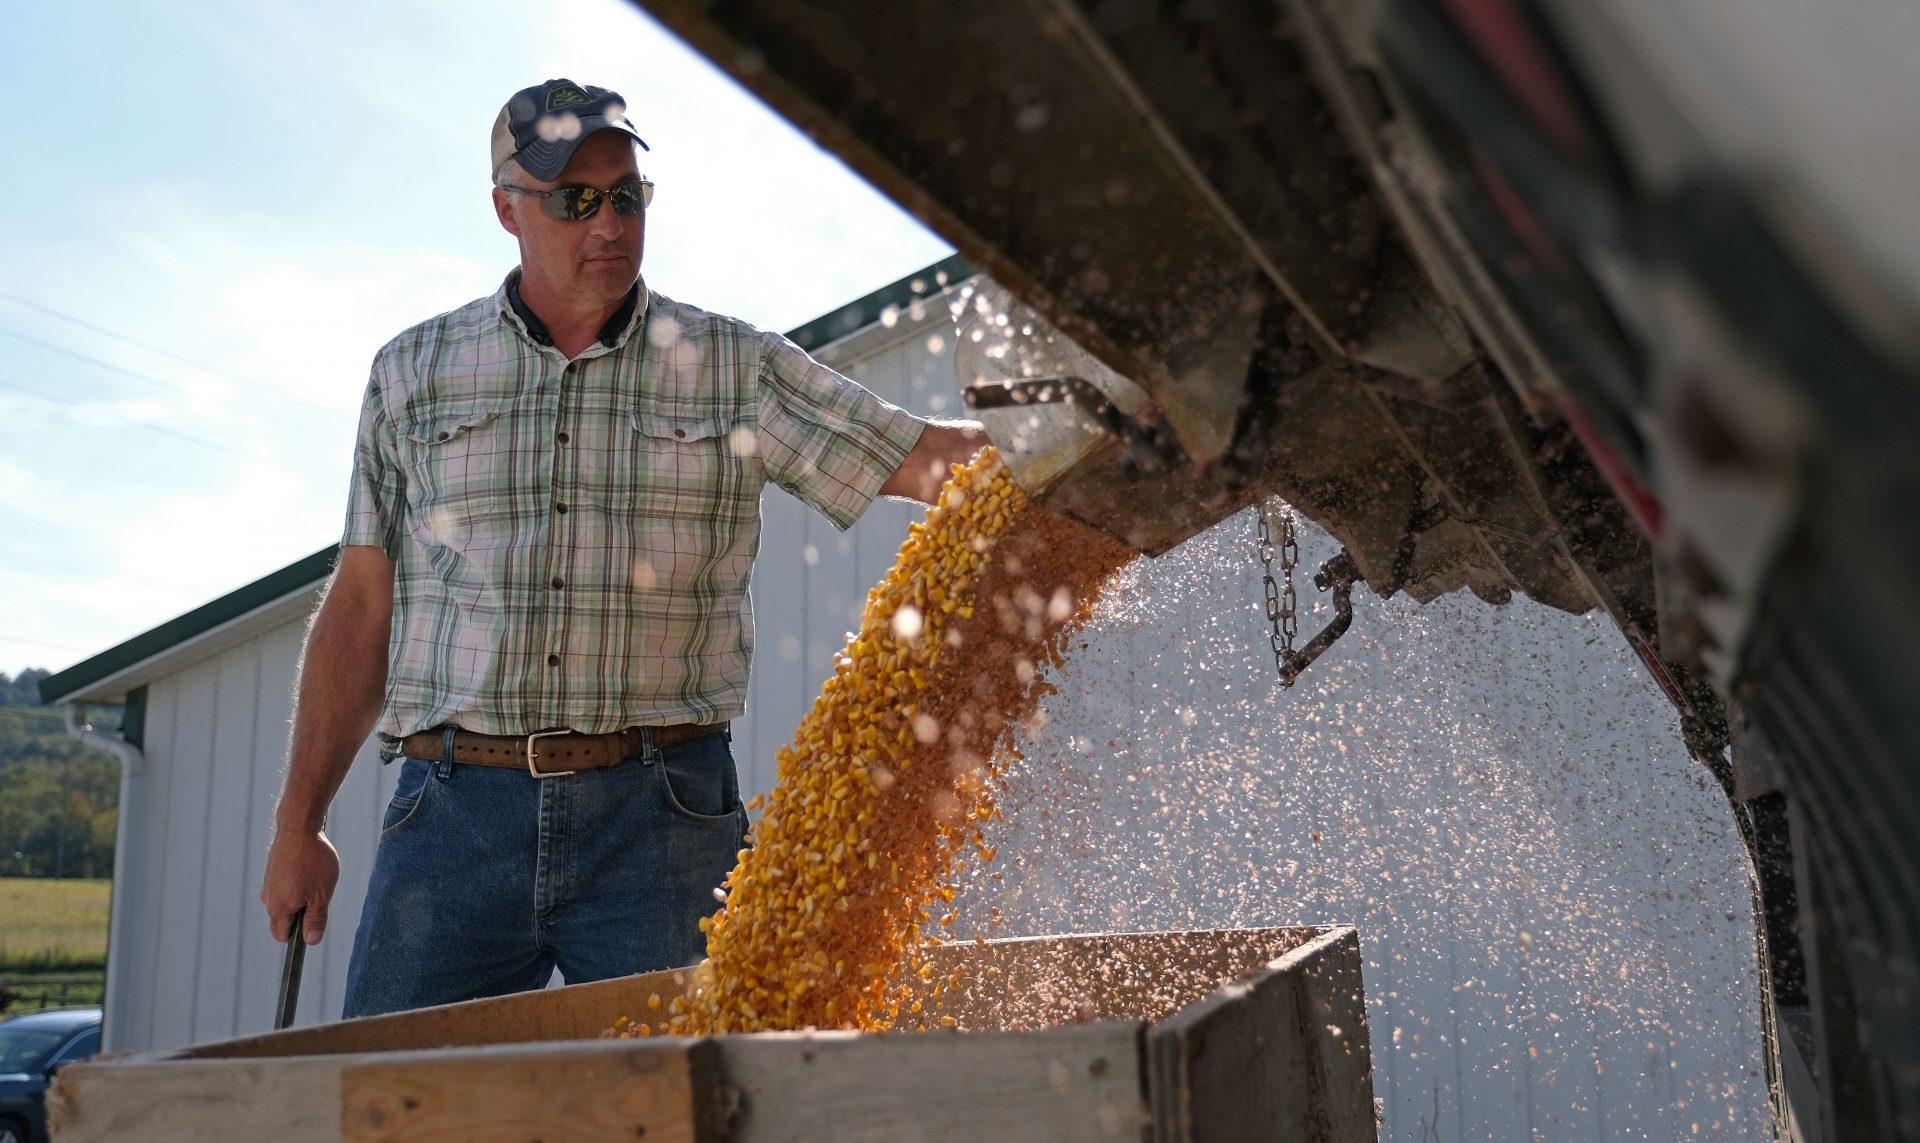 Grain farmer Mike Braucher works on unloading harvested corn Sept. 27, 2019, at Braucher Farms in Centre Township, Pennsylvania.